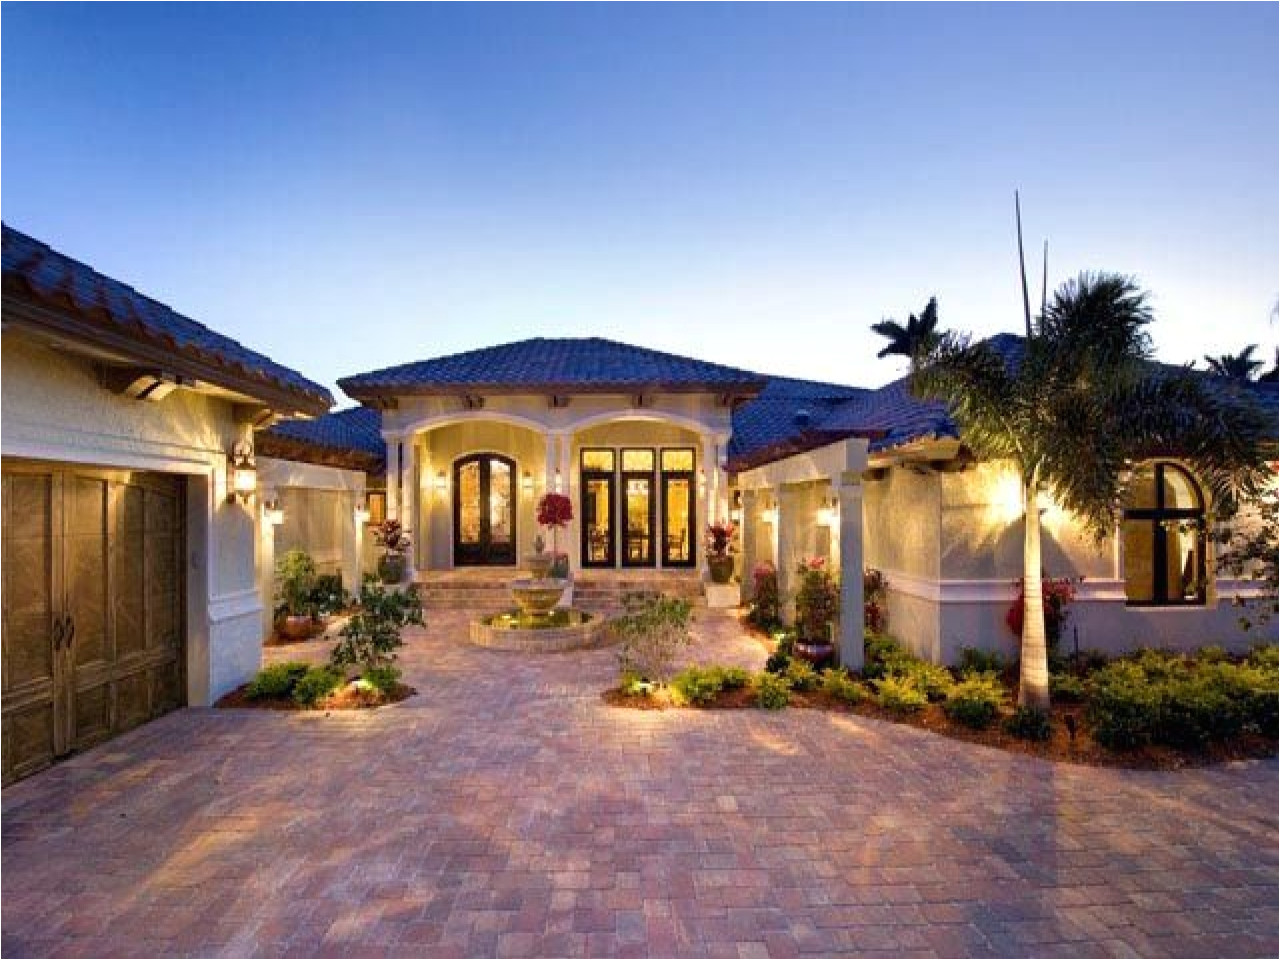 4bc2f29ef39059e2 mediterranean model homes florida luxury mediterranean house plan